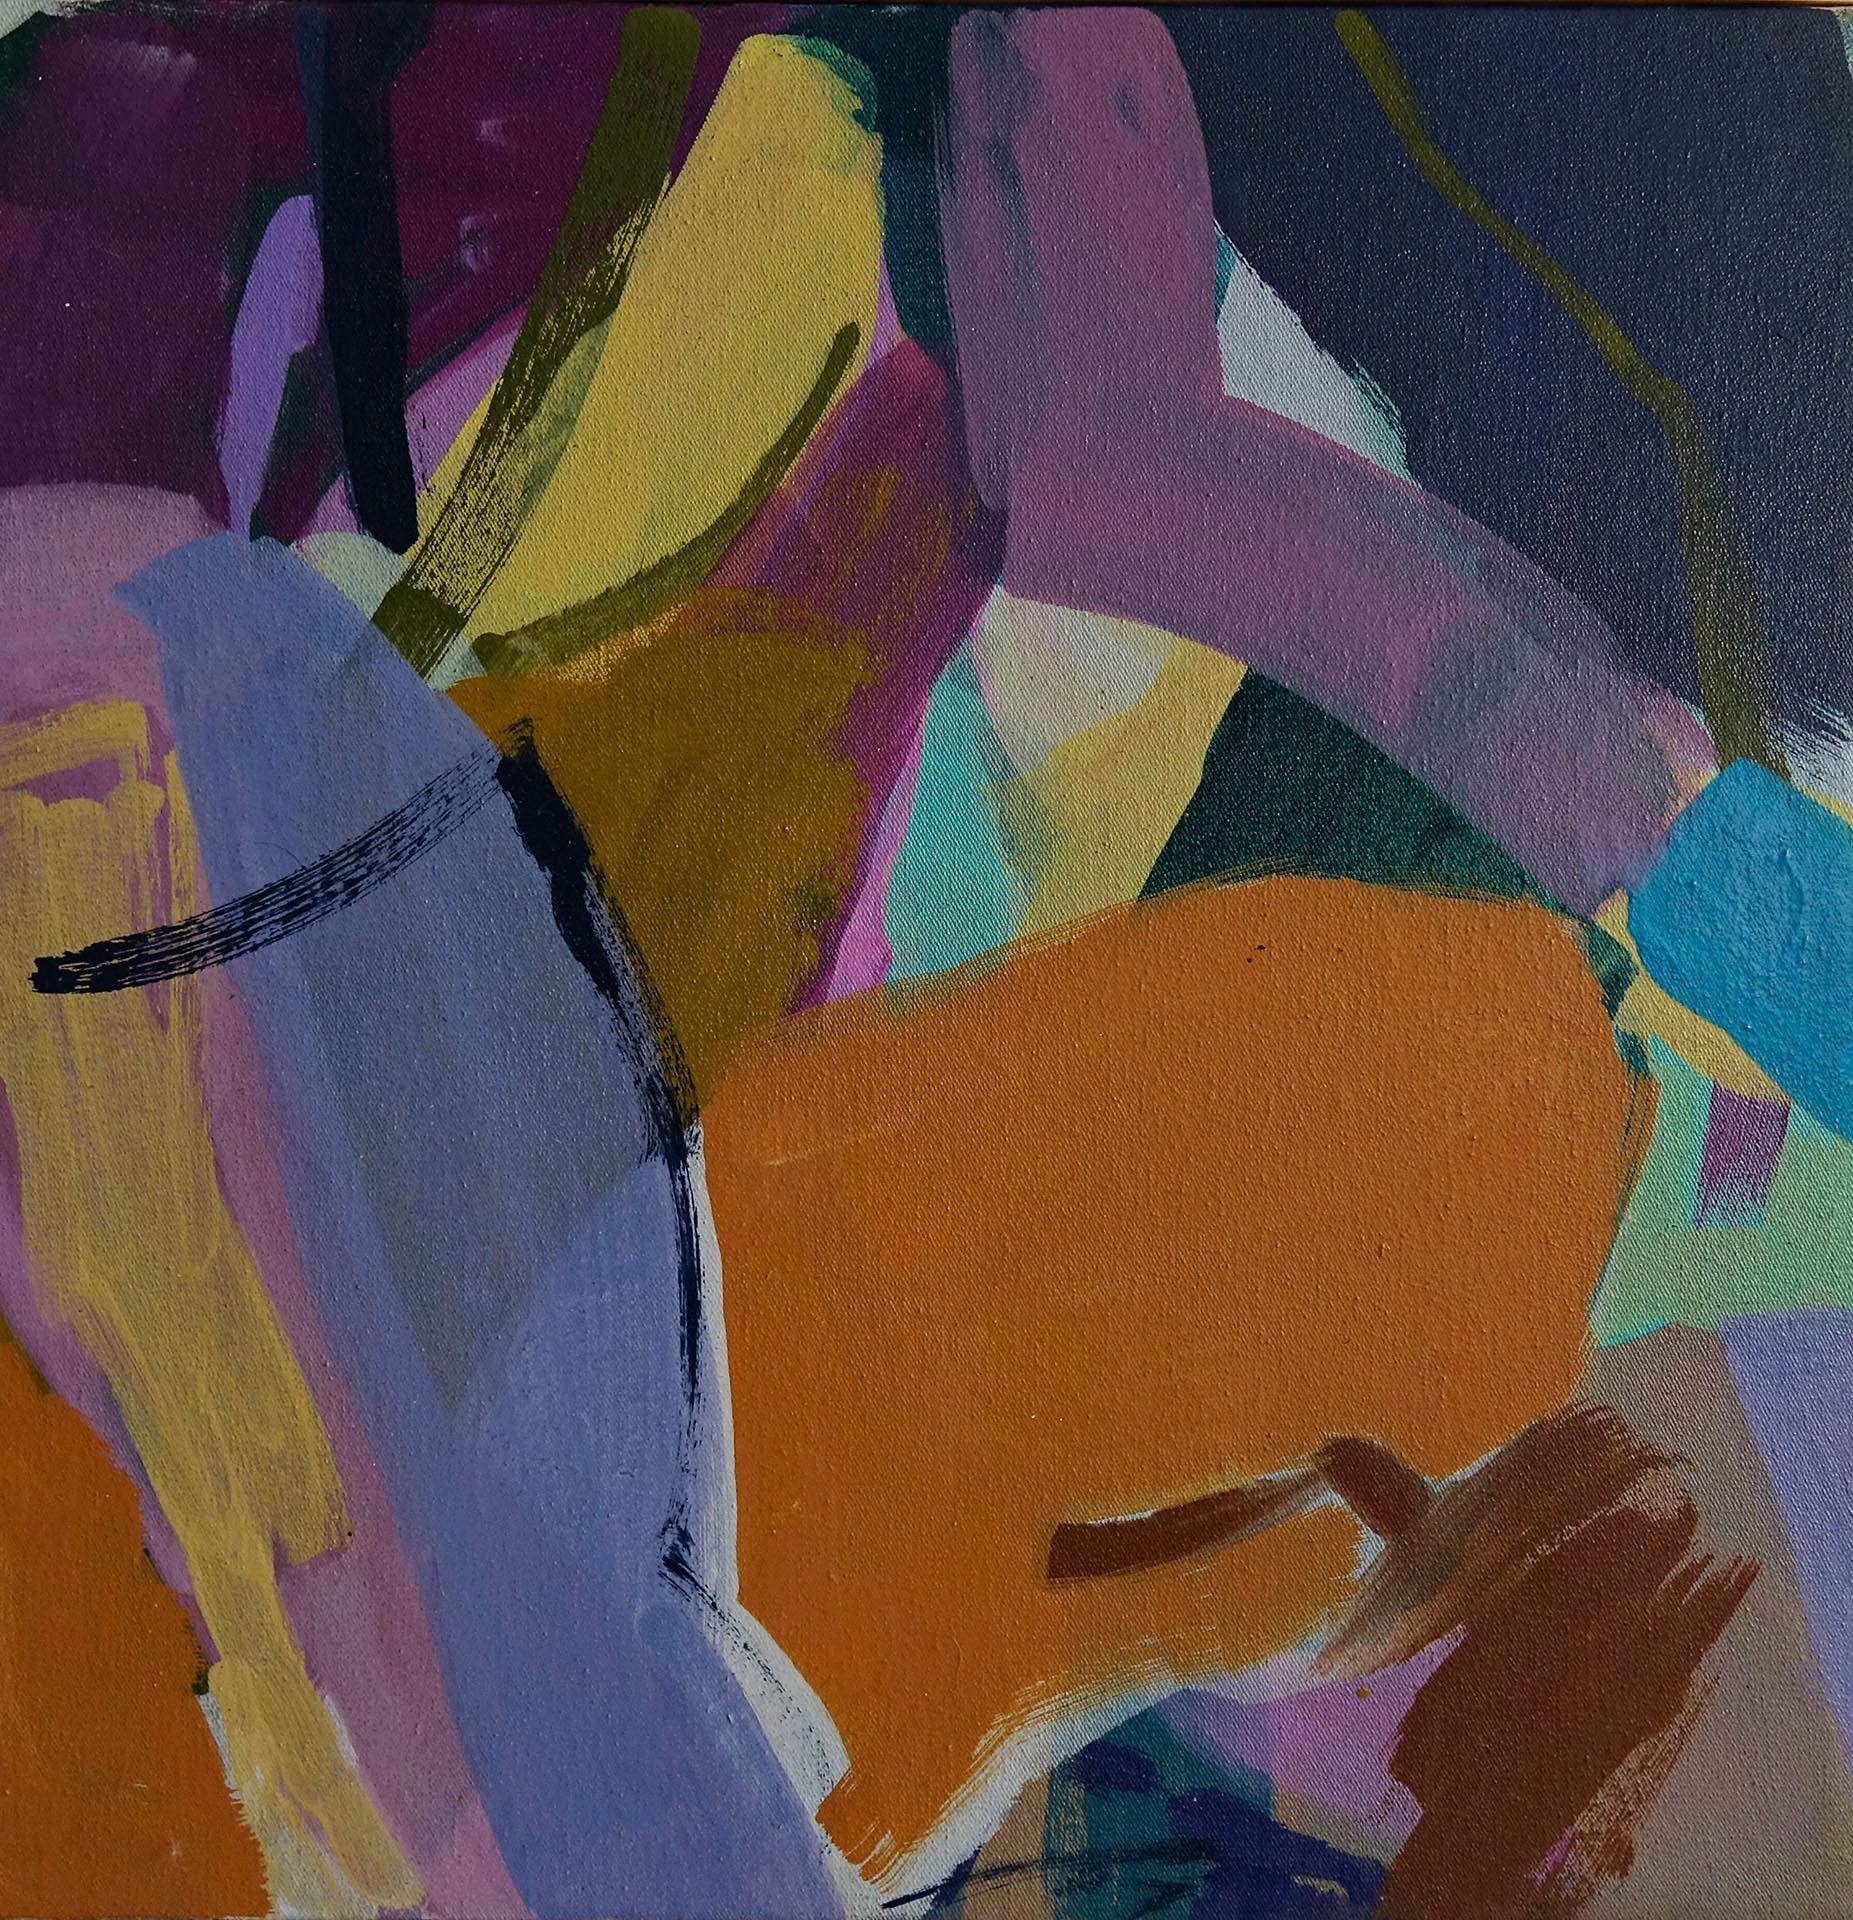 Violetta Ehnsperg | Sunset Boulevard | 41 x 41 cm | Galerie3